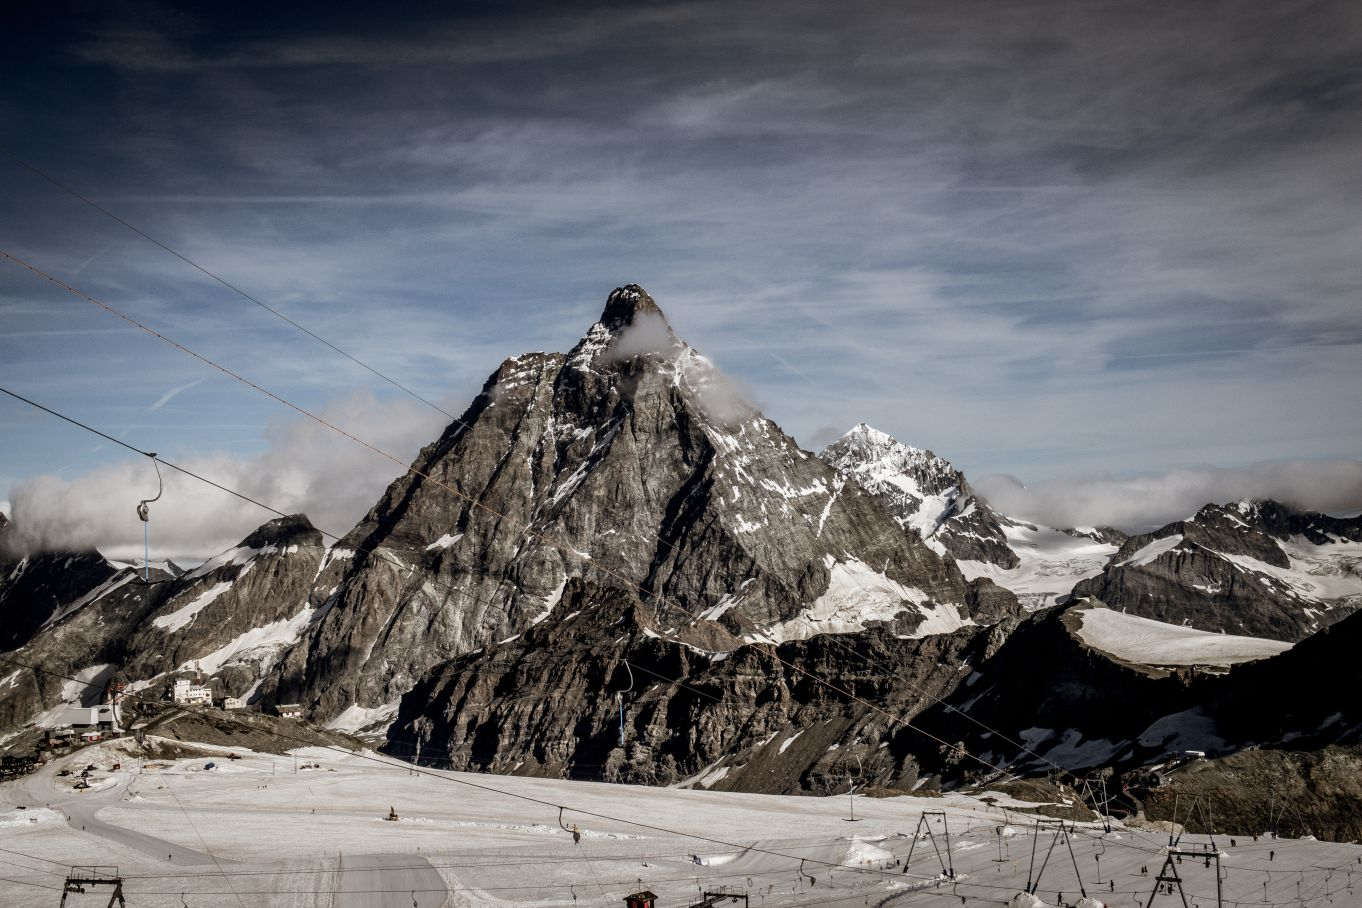 Il Cervino - The Matterhorn